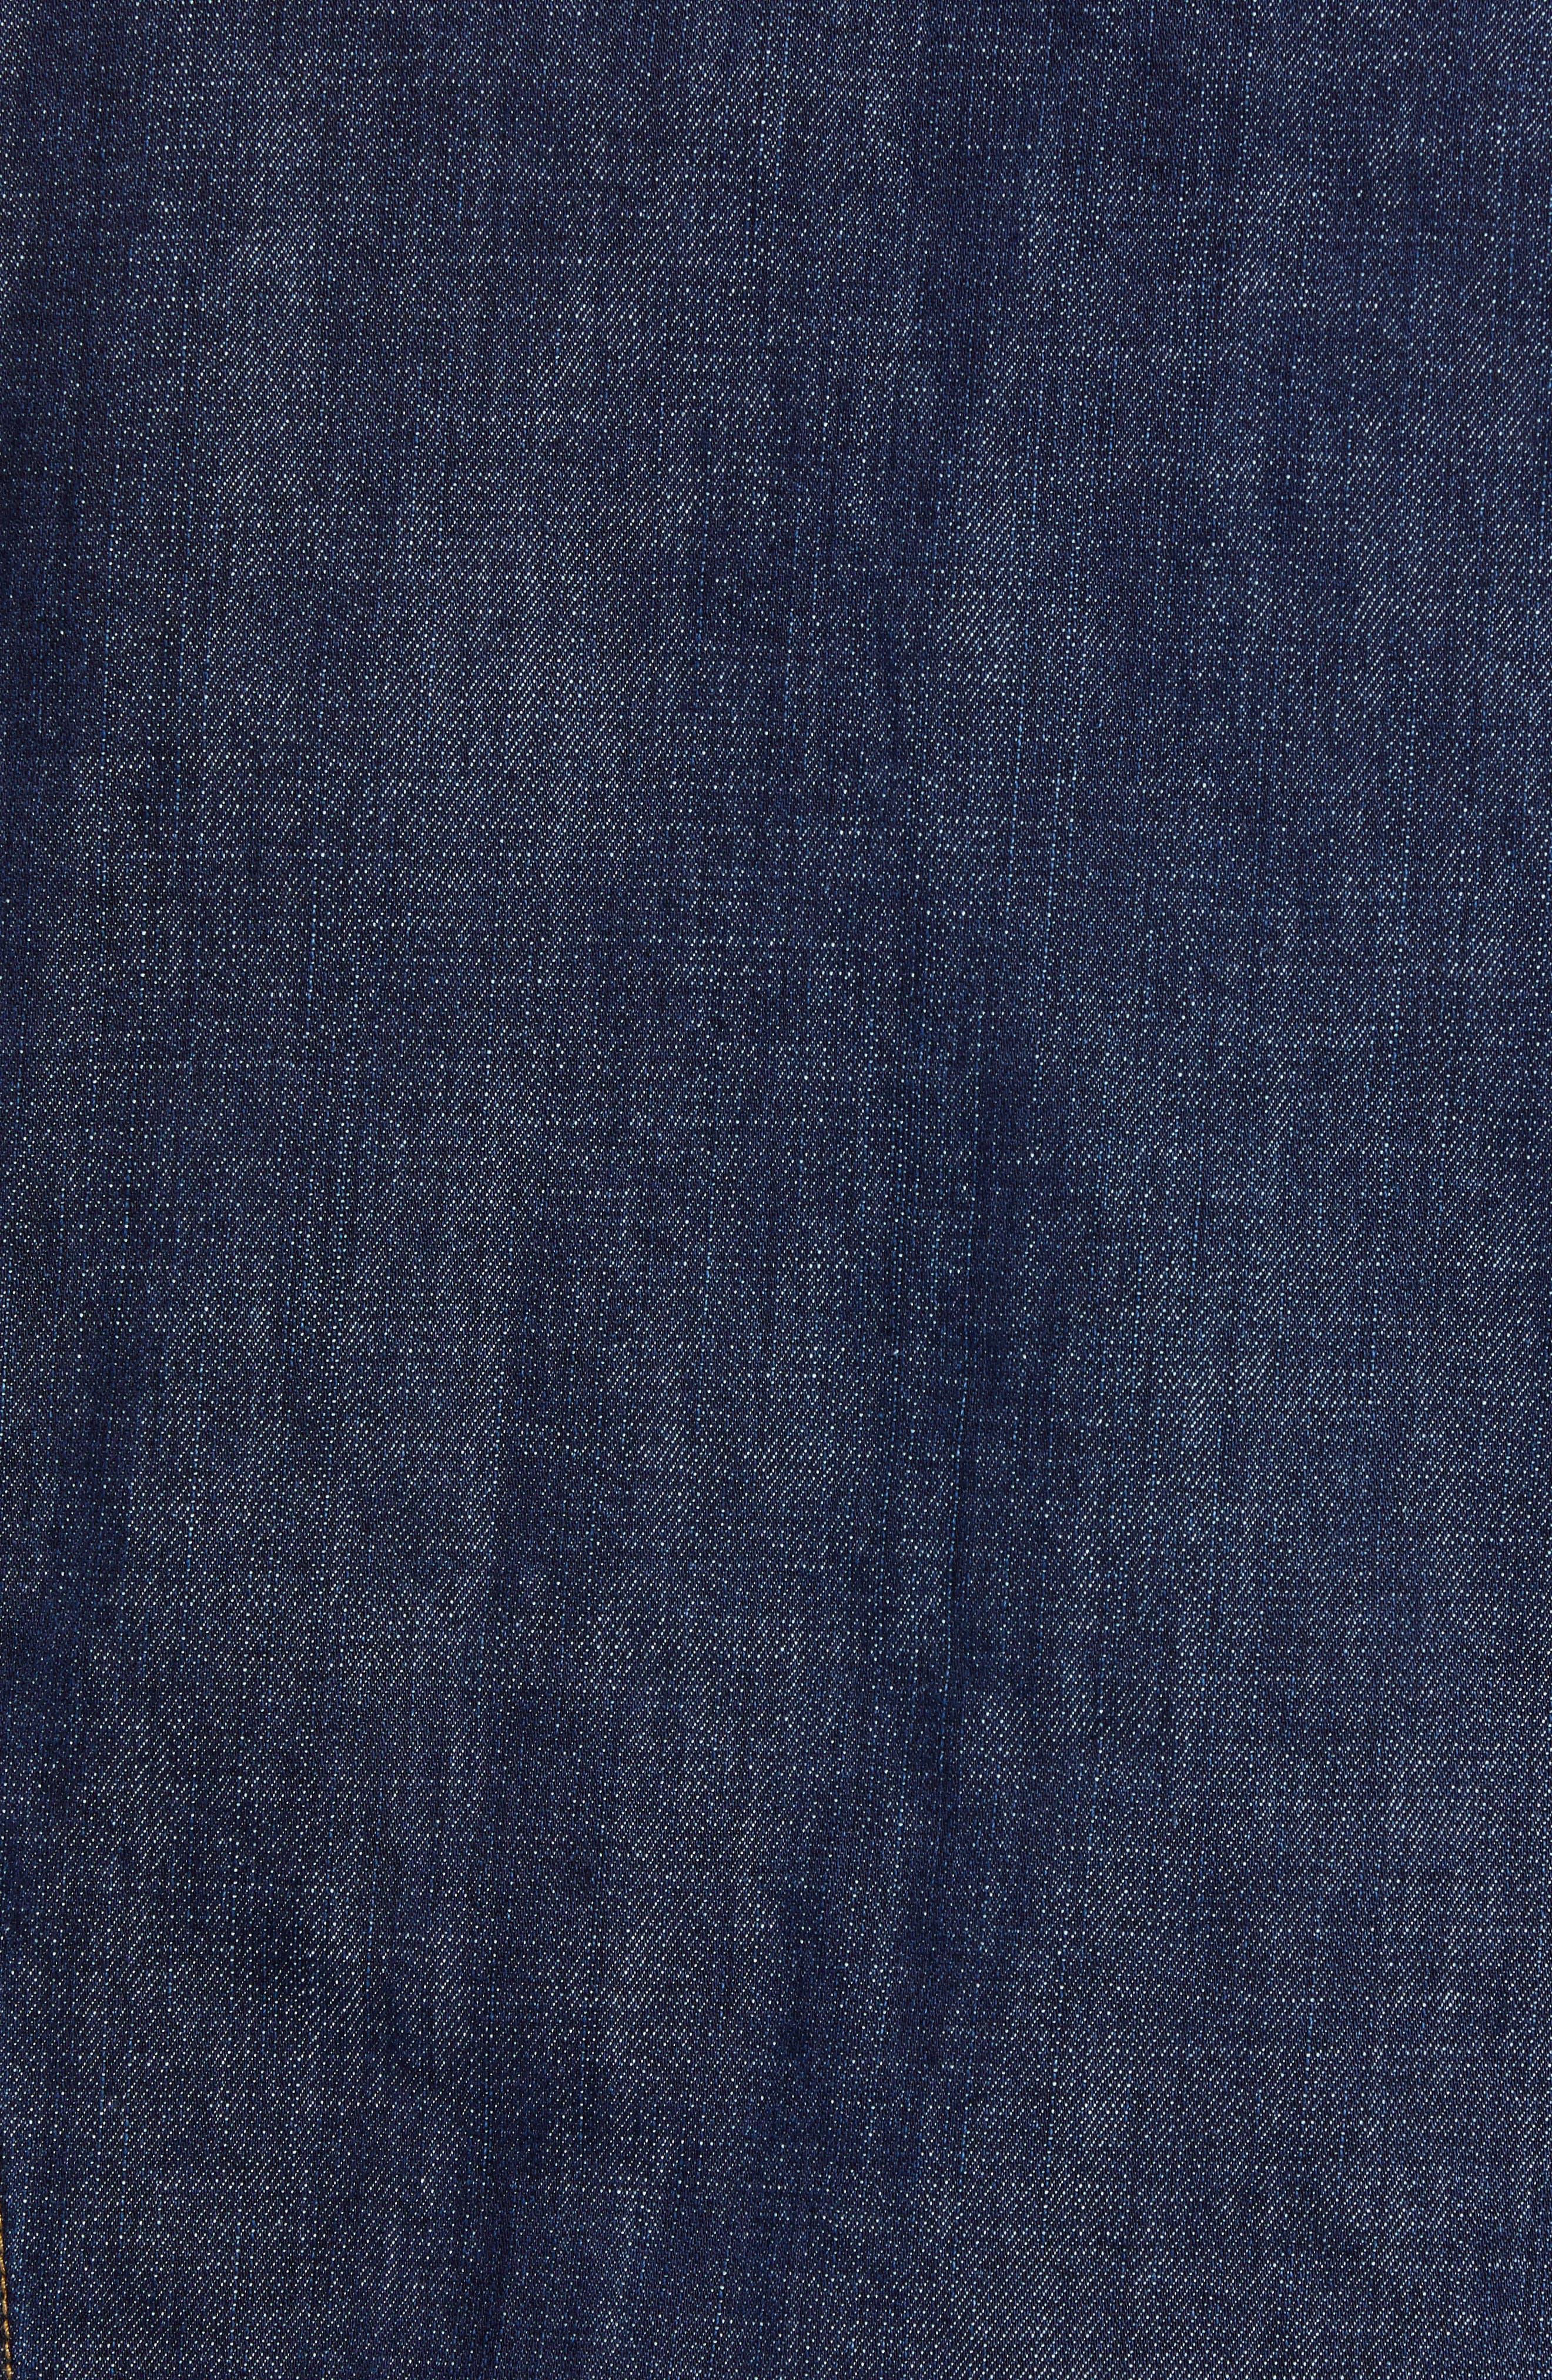 WRANGLER,                             Heritage Fleece Lined Denim Jacket,                             Alternate thumbnail 7, color,                             DARK